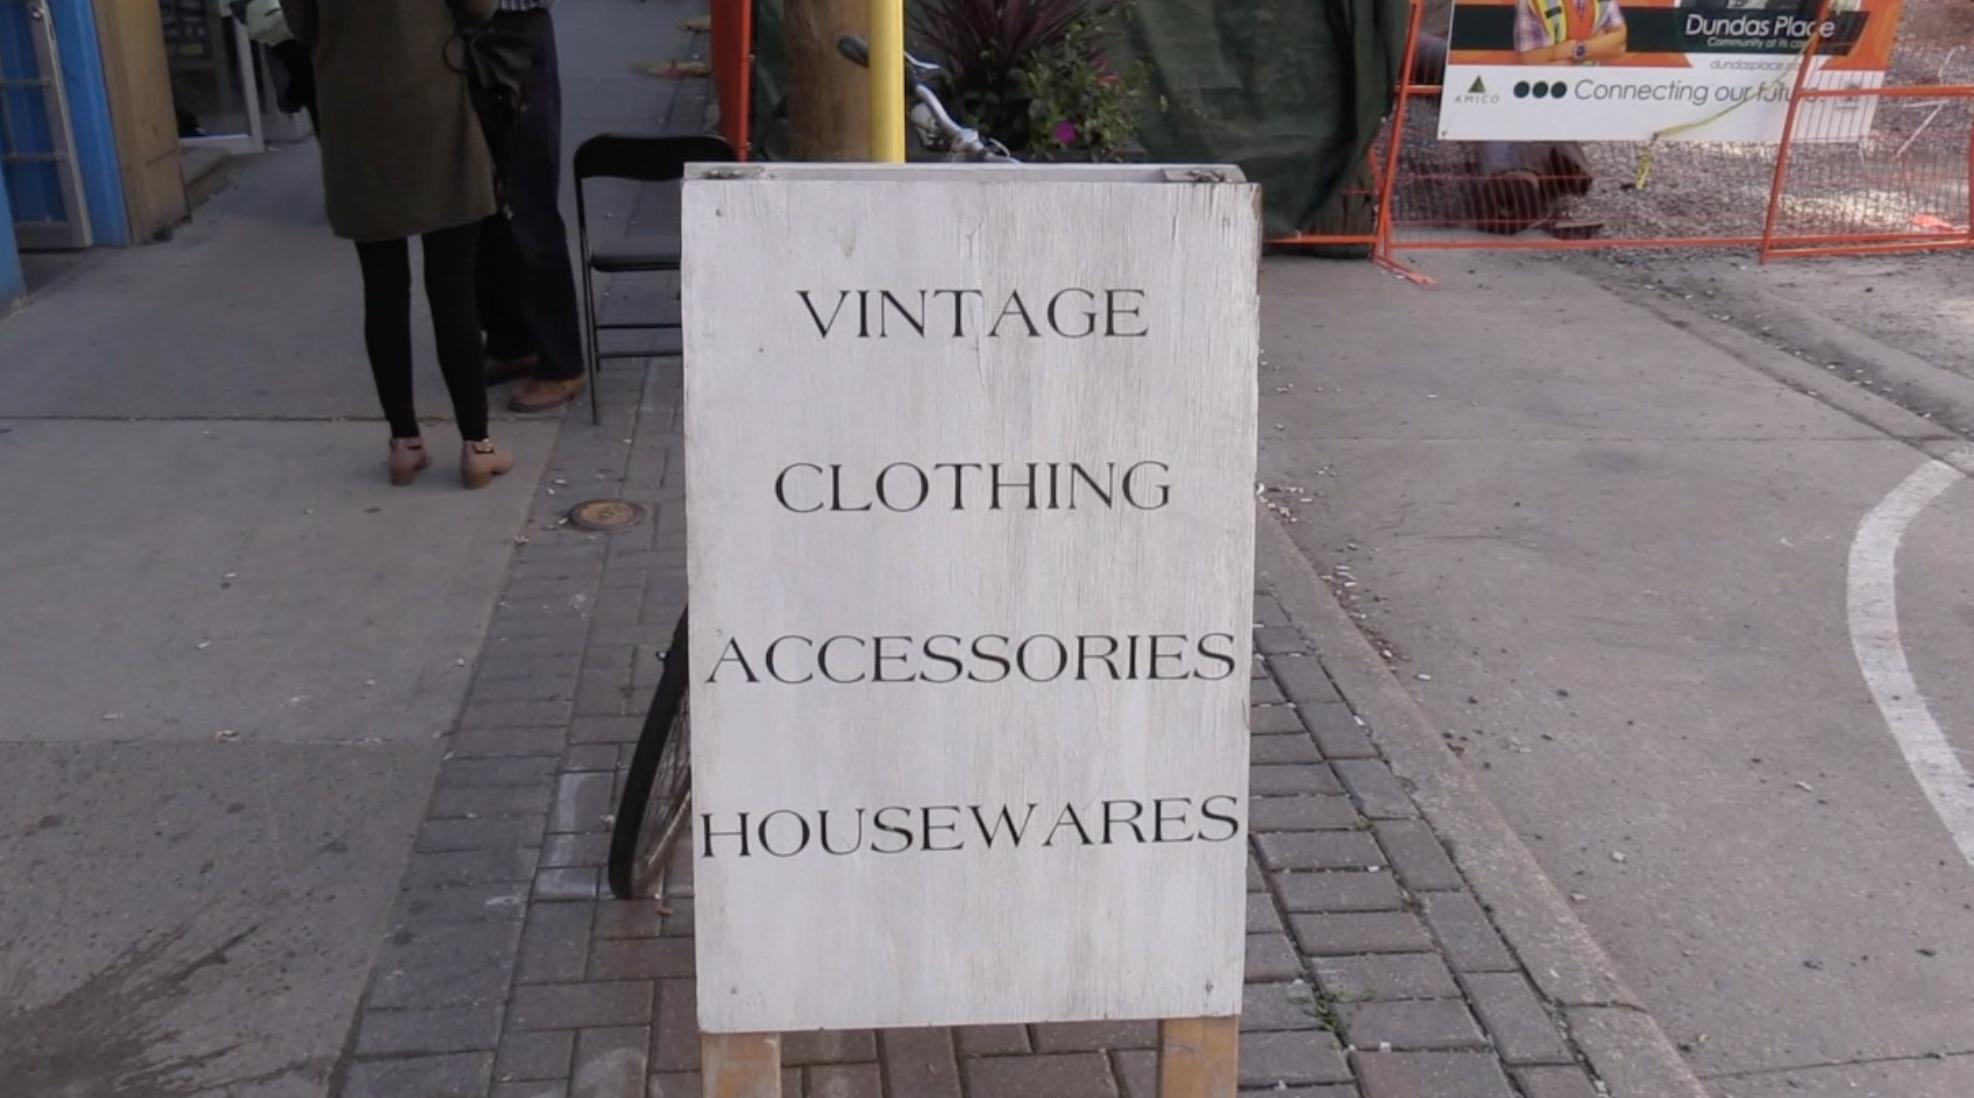 Exploring London's vintage market